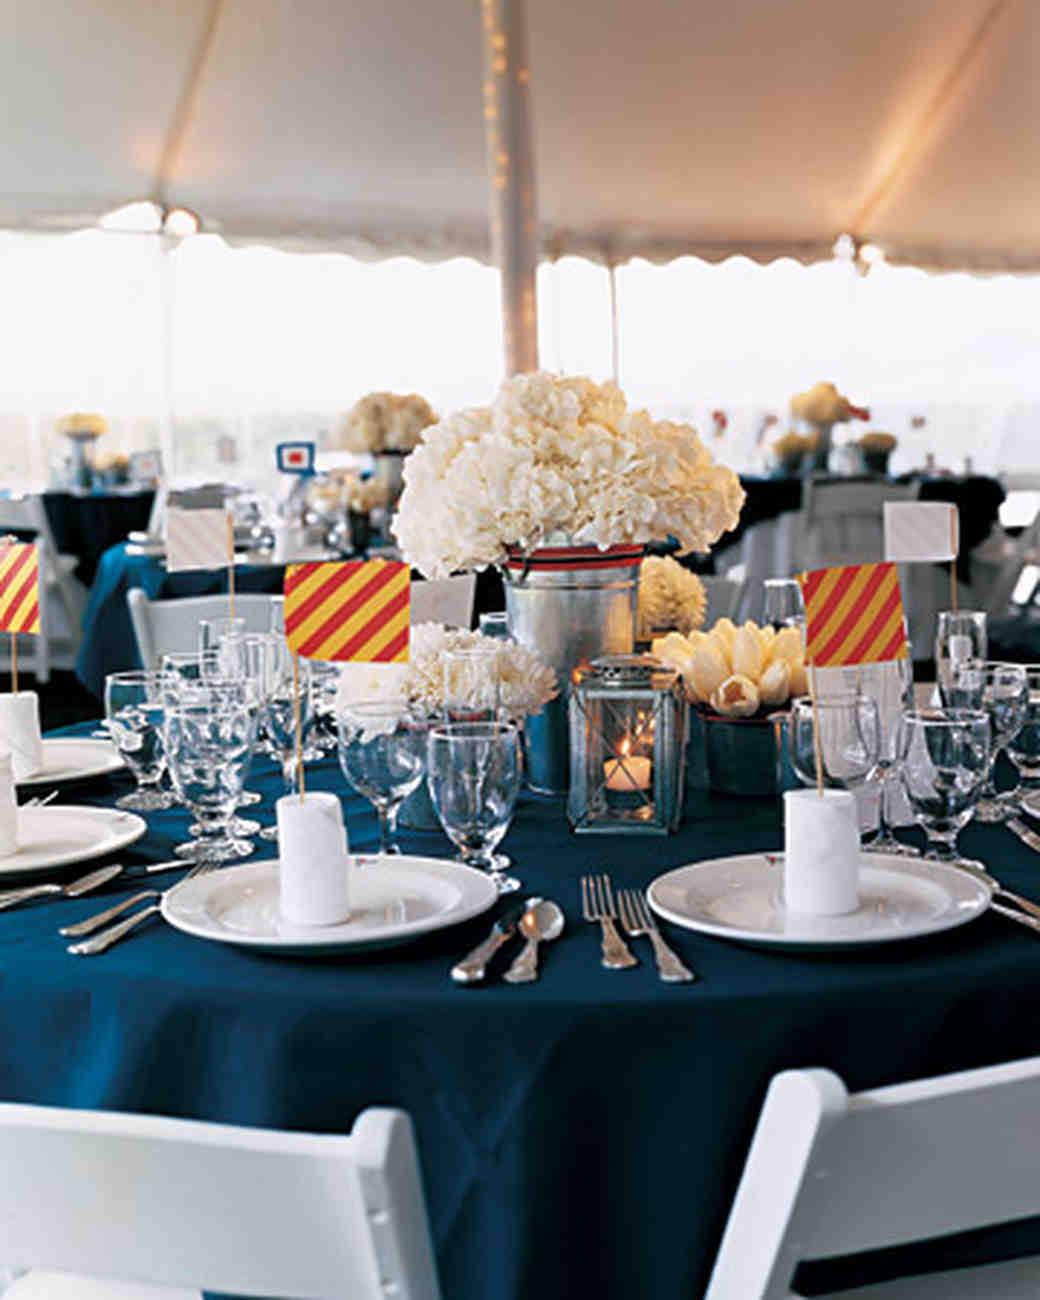 Cheap wedding decoration centerpieces ideas wedding for Affordable wedding decoration